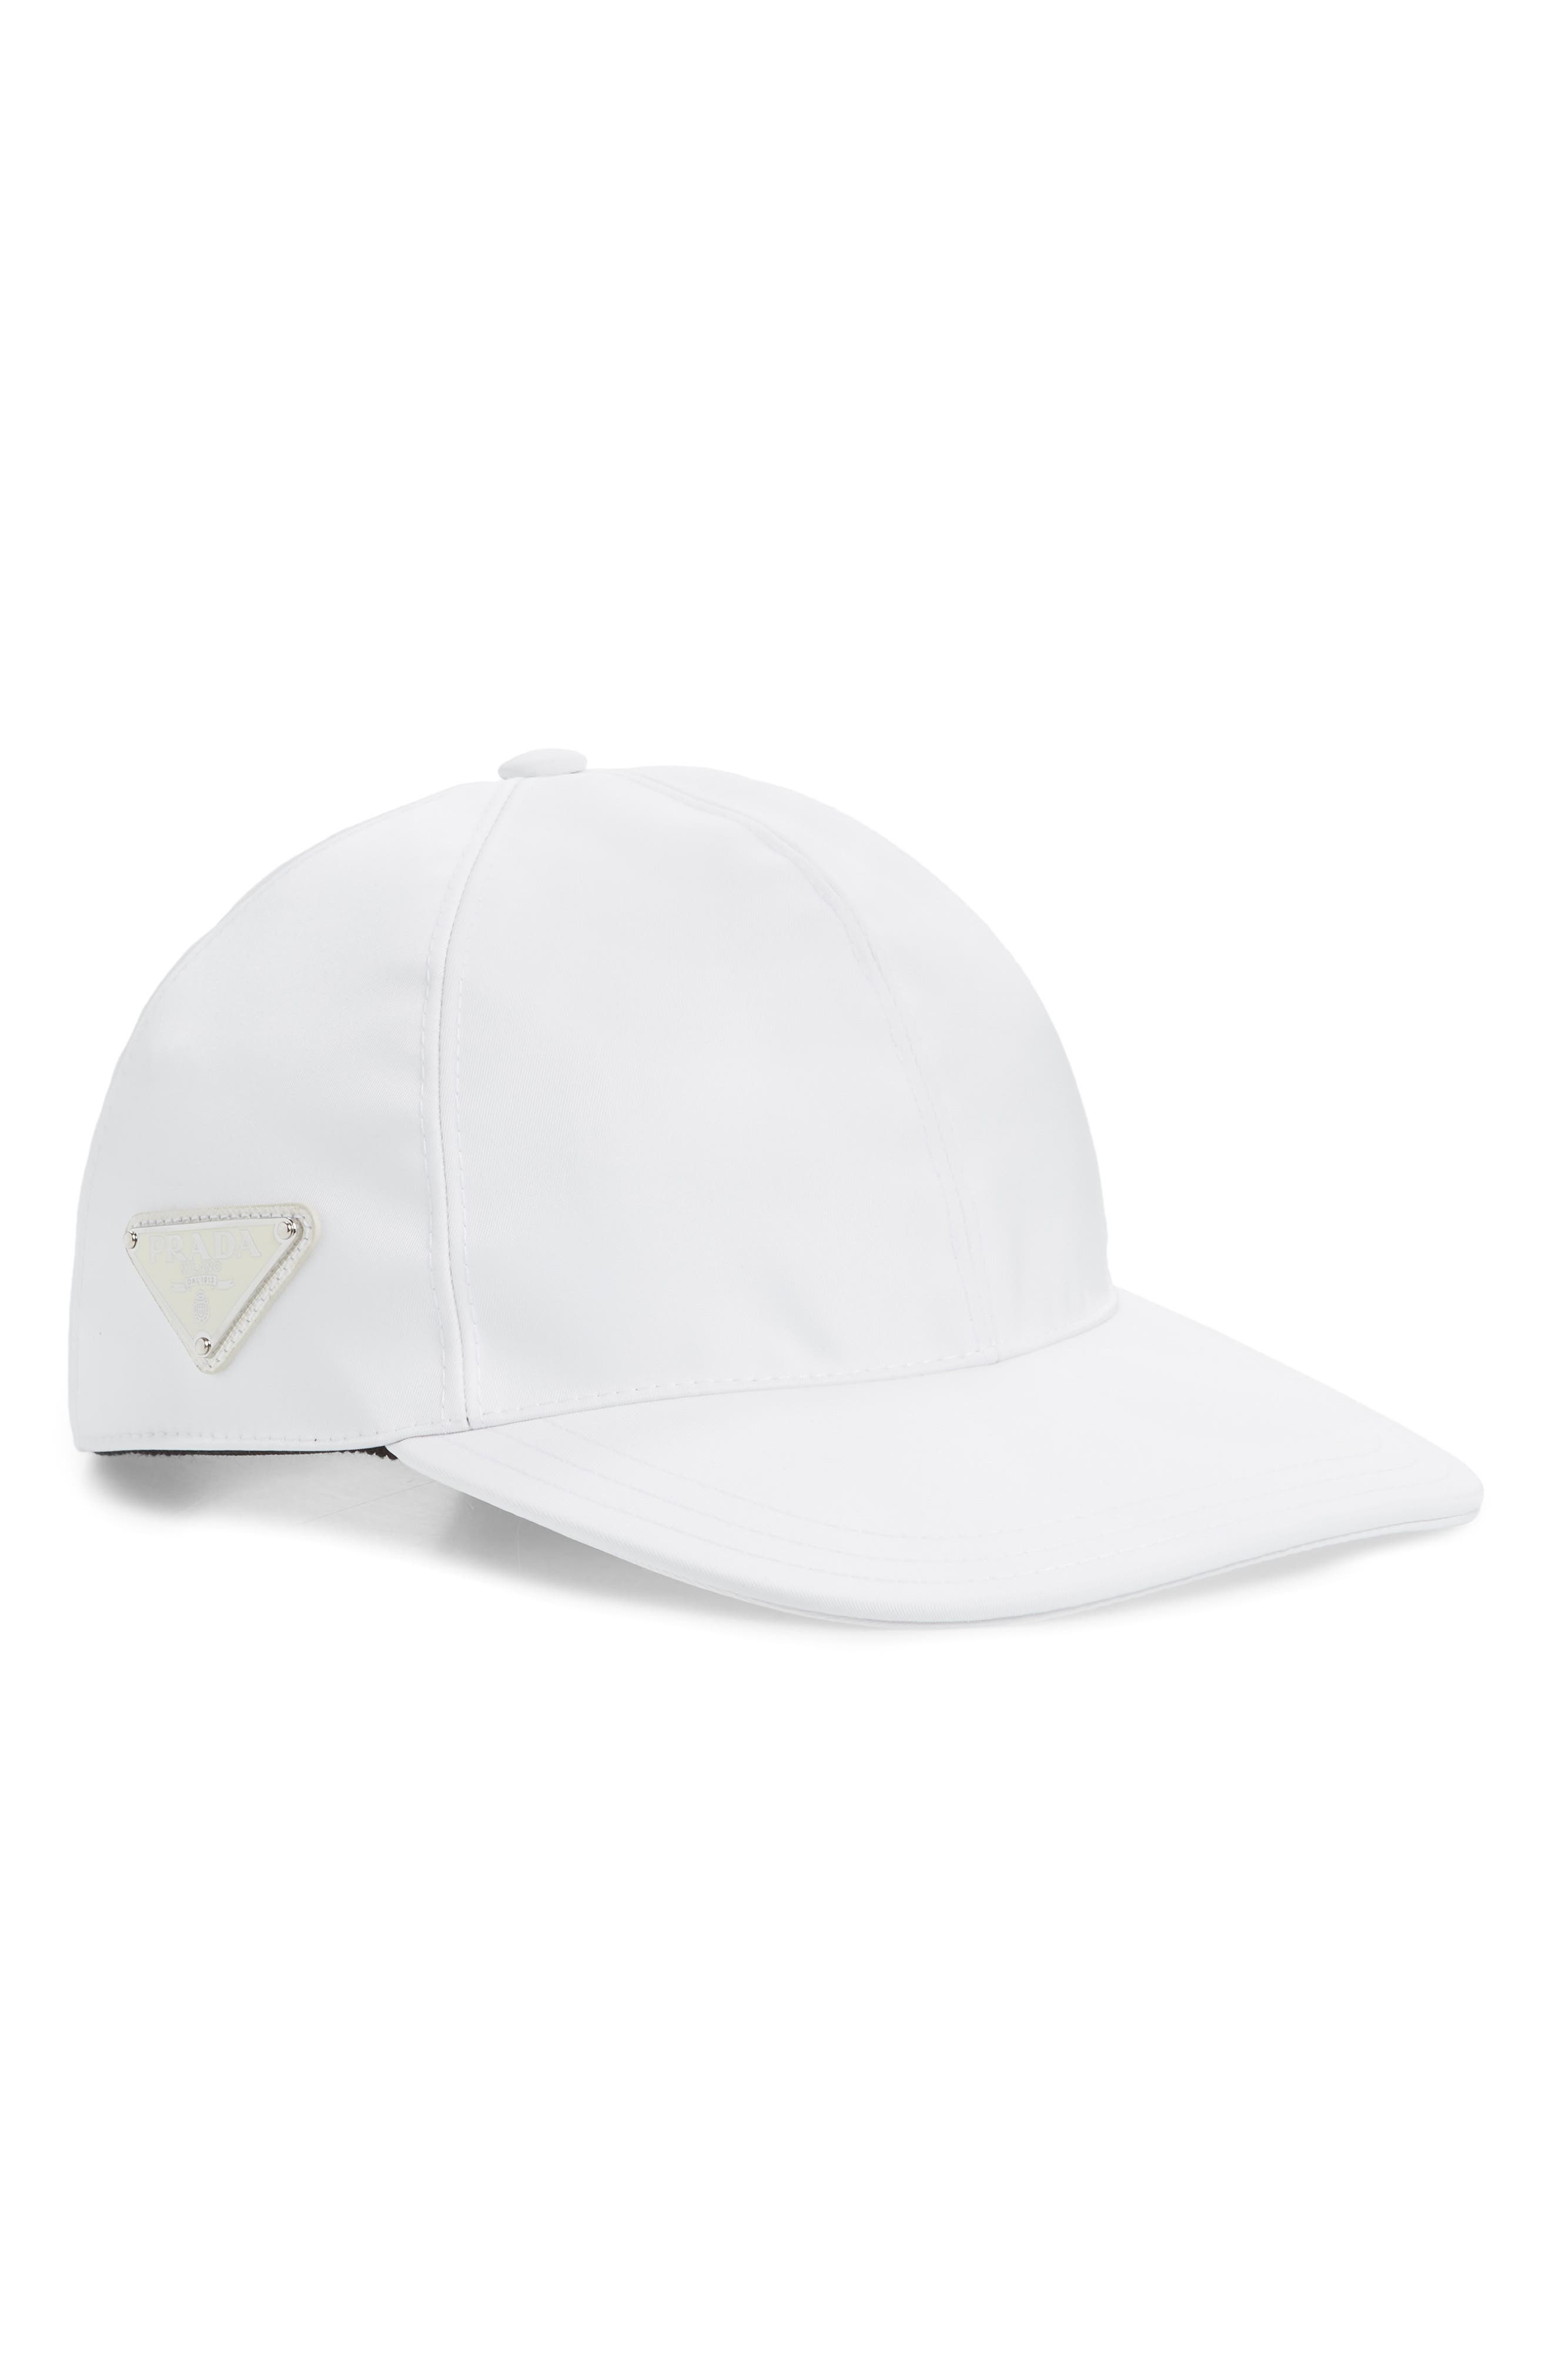 34caf89e9e4c2 White Baseball Caps